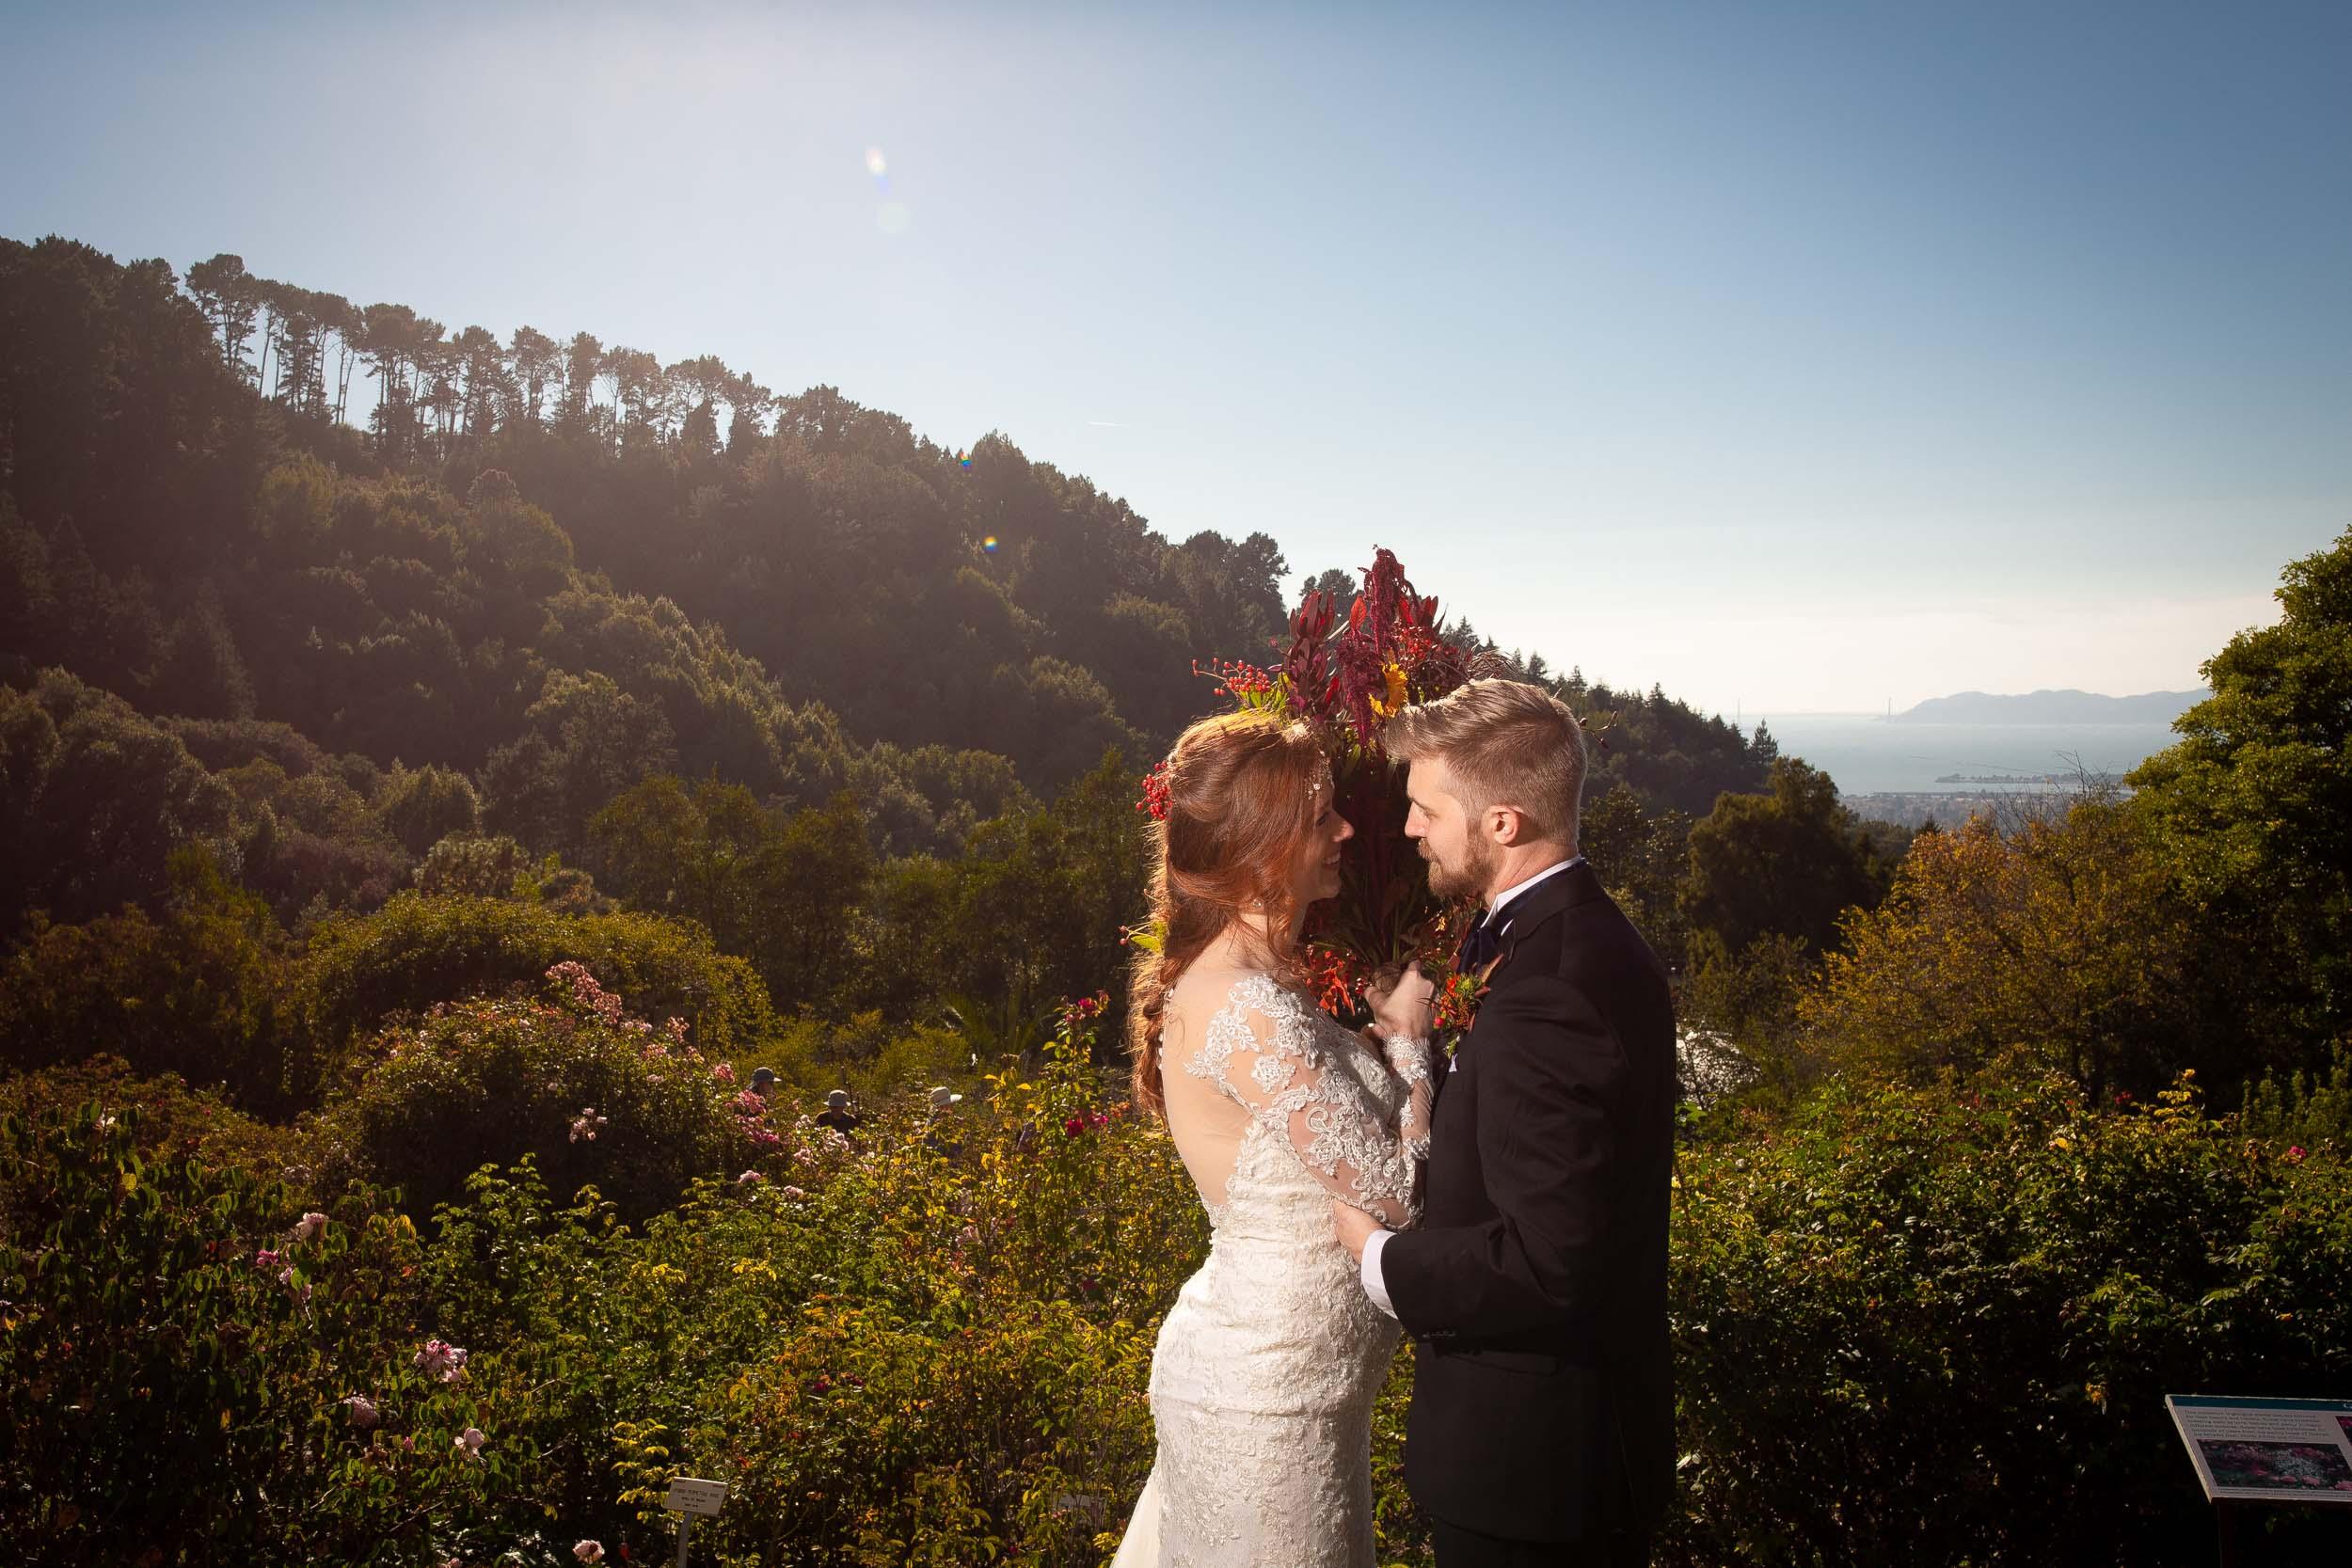 Berkeley Botanical Garden Wedding Ceremony in the Redwood Grove Ceremony and SF Bay Wedding Cruise Reception-58.jpg